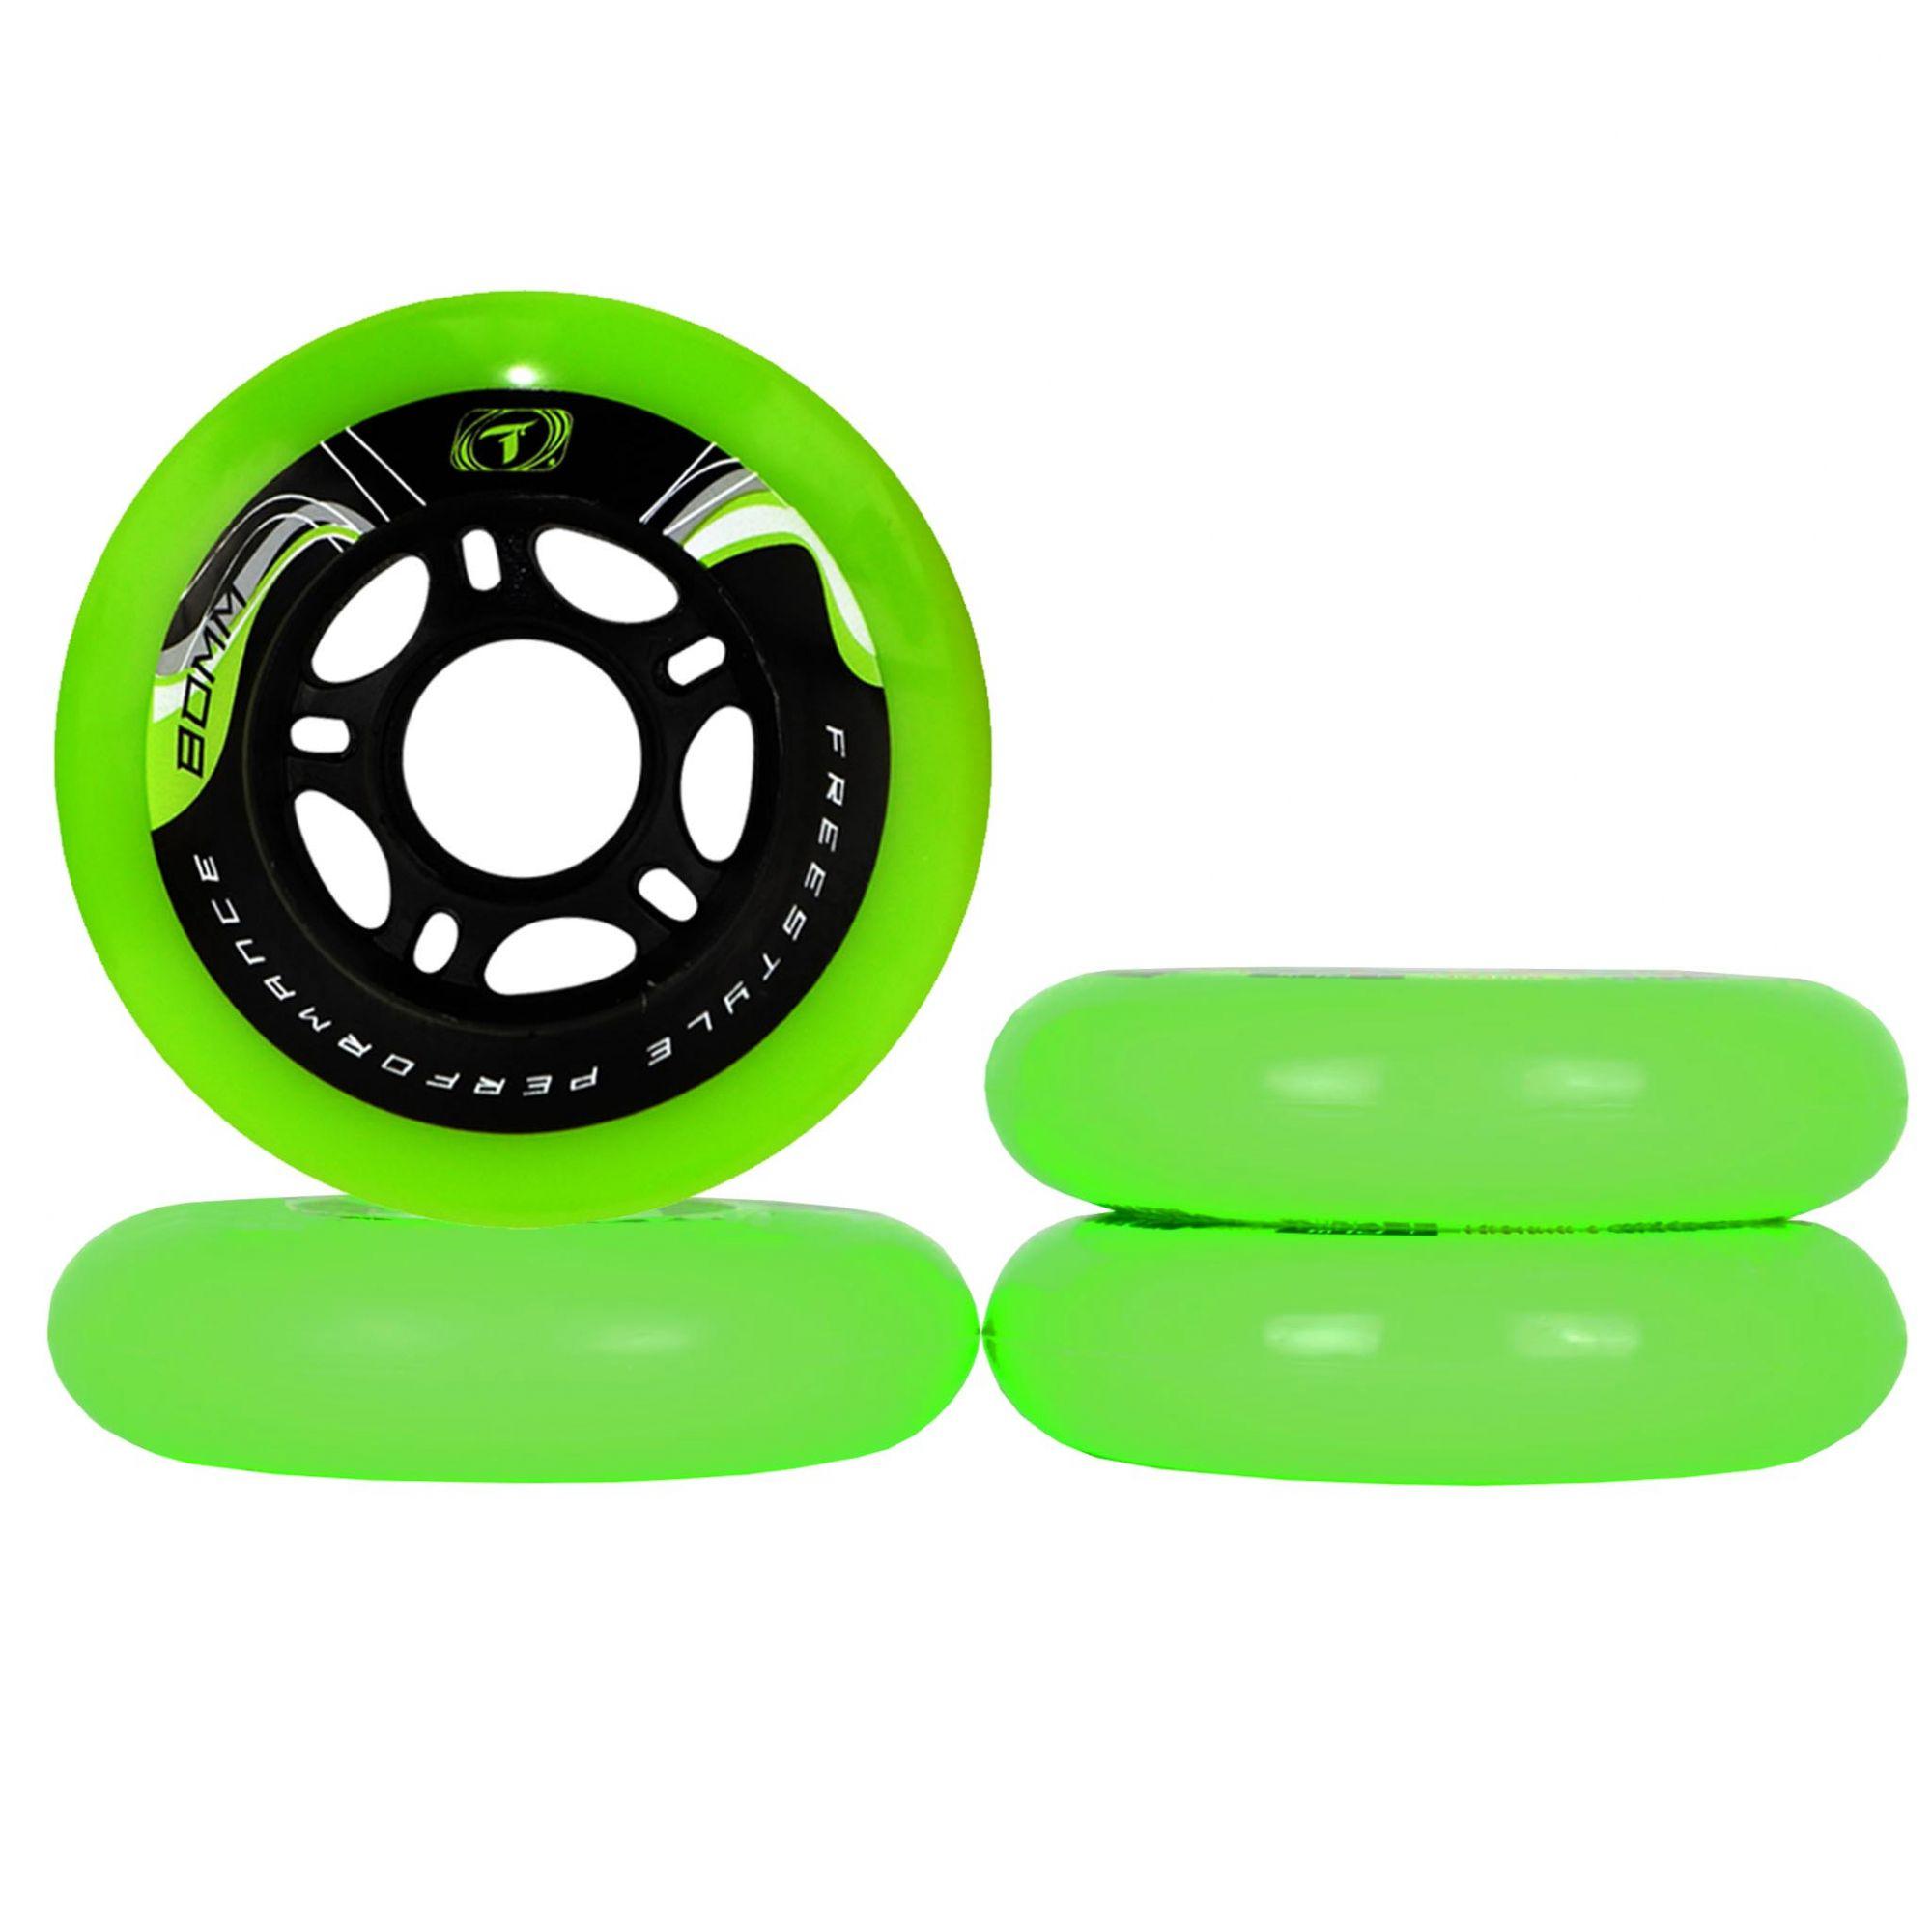 Jogo de Rodas Traxart Freestyle Krazyleg 80mm - Verde